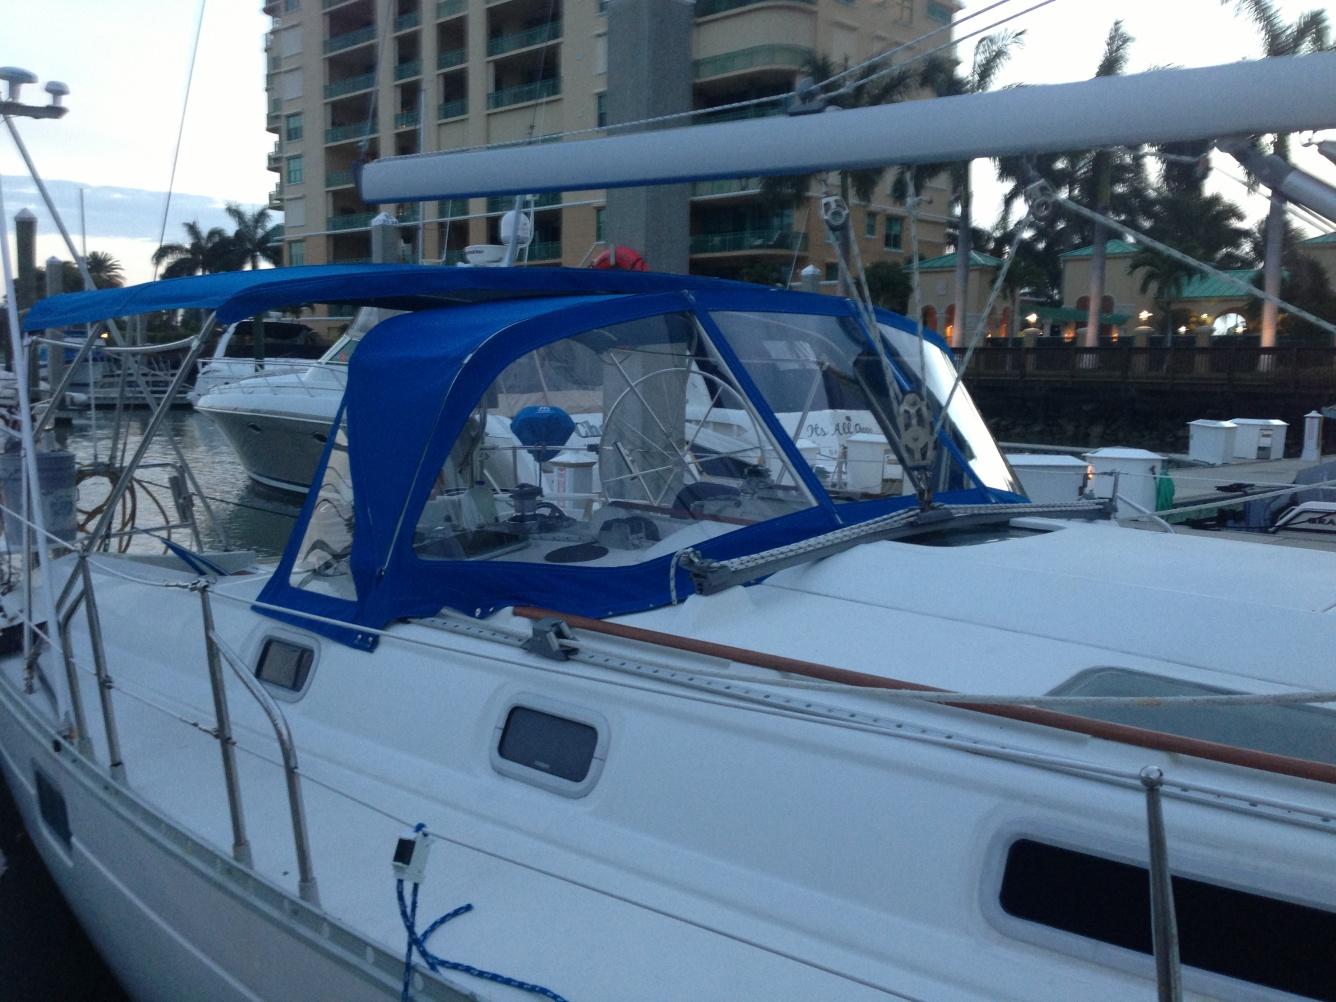 Click image for larger version  Name:boat dodger 005.jpg Views:160 Size:420.2 KB ID:62748